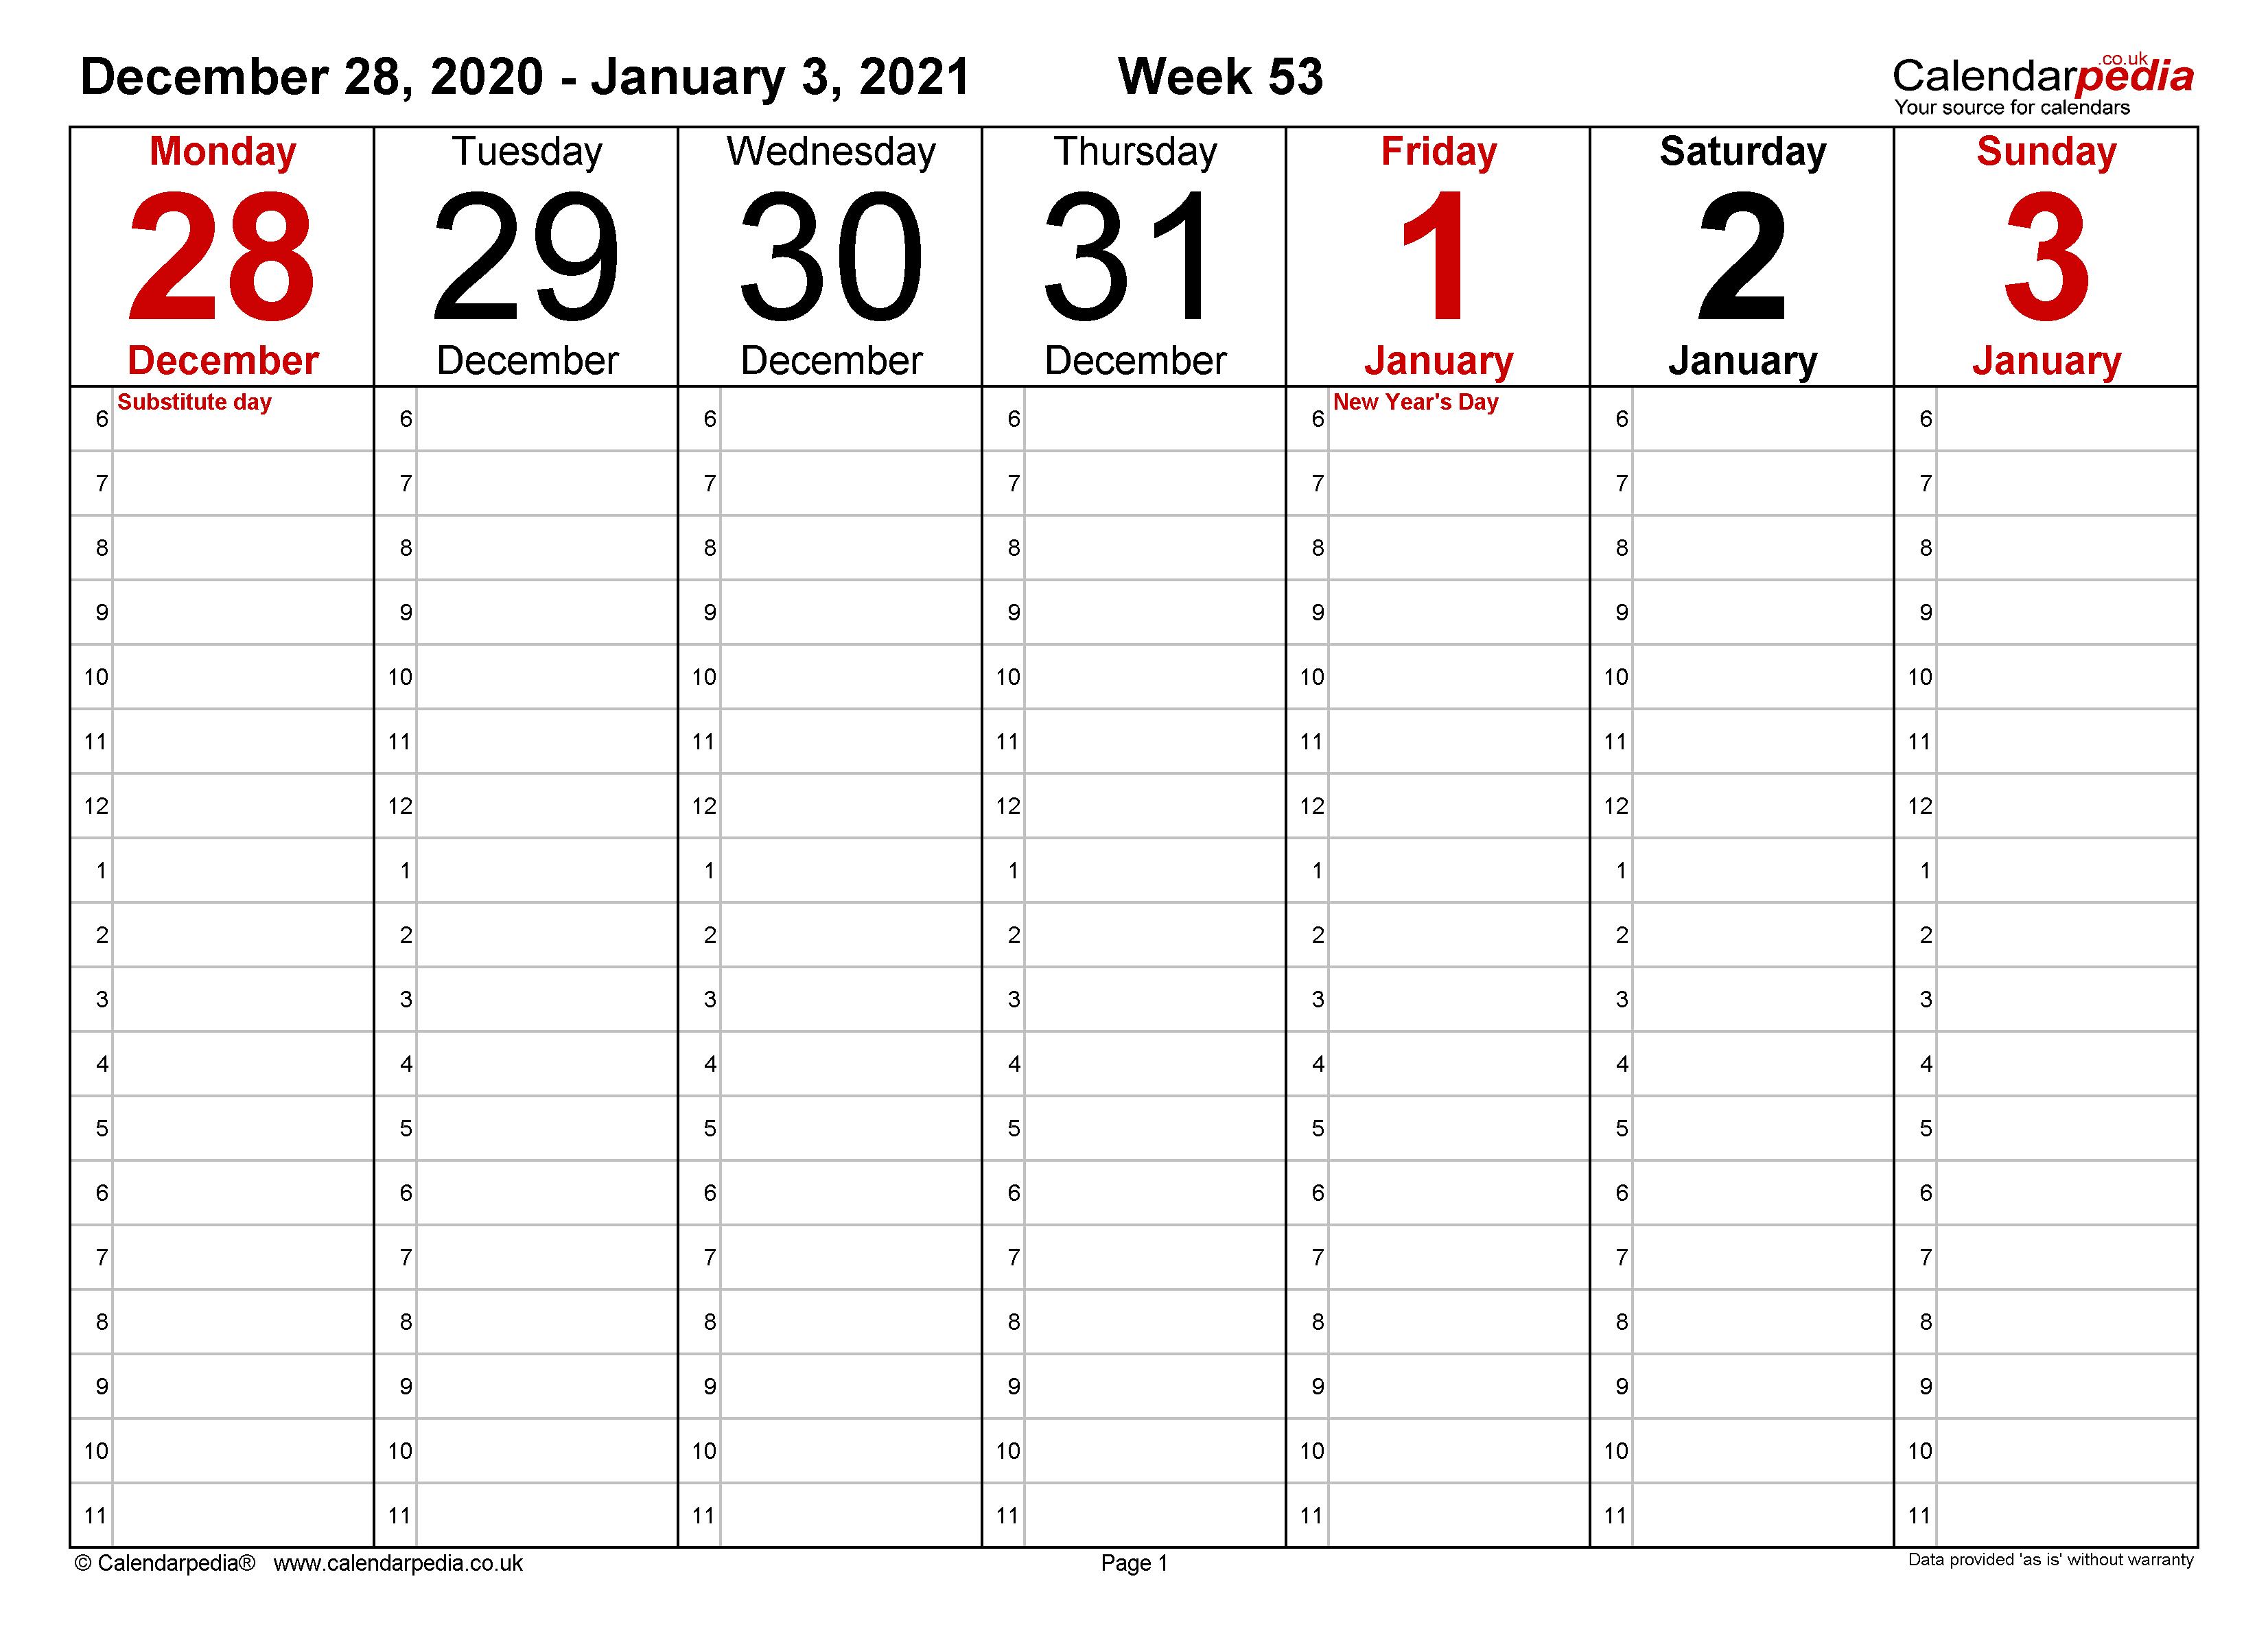 Weekly calendar 2021 UK - free printable templates for Word